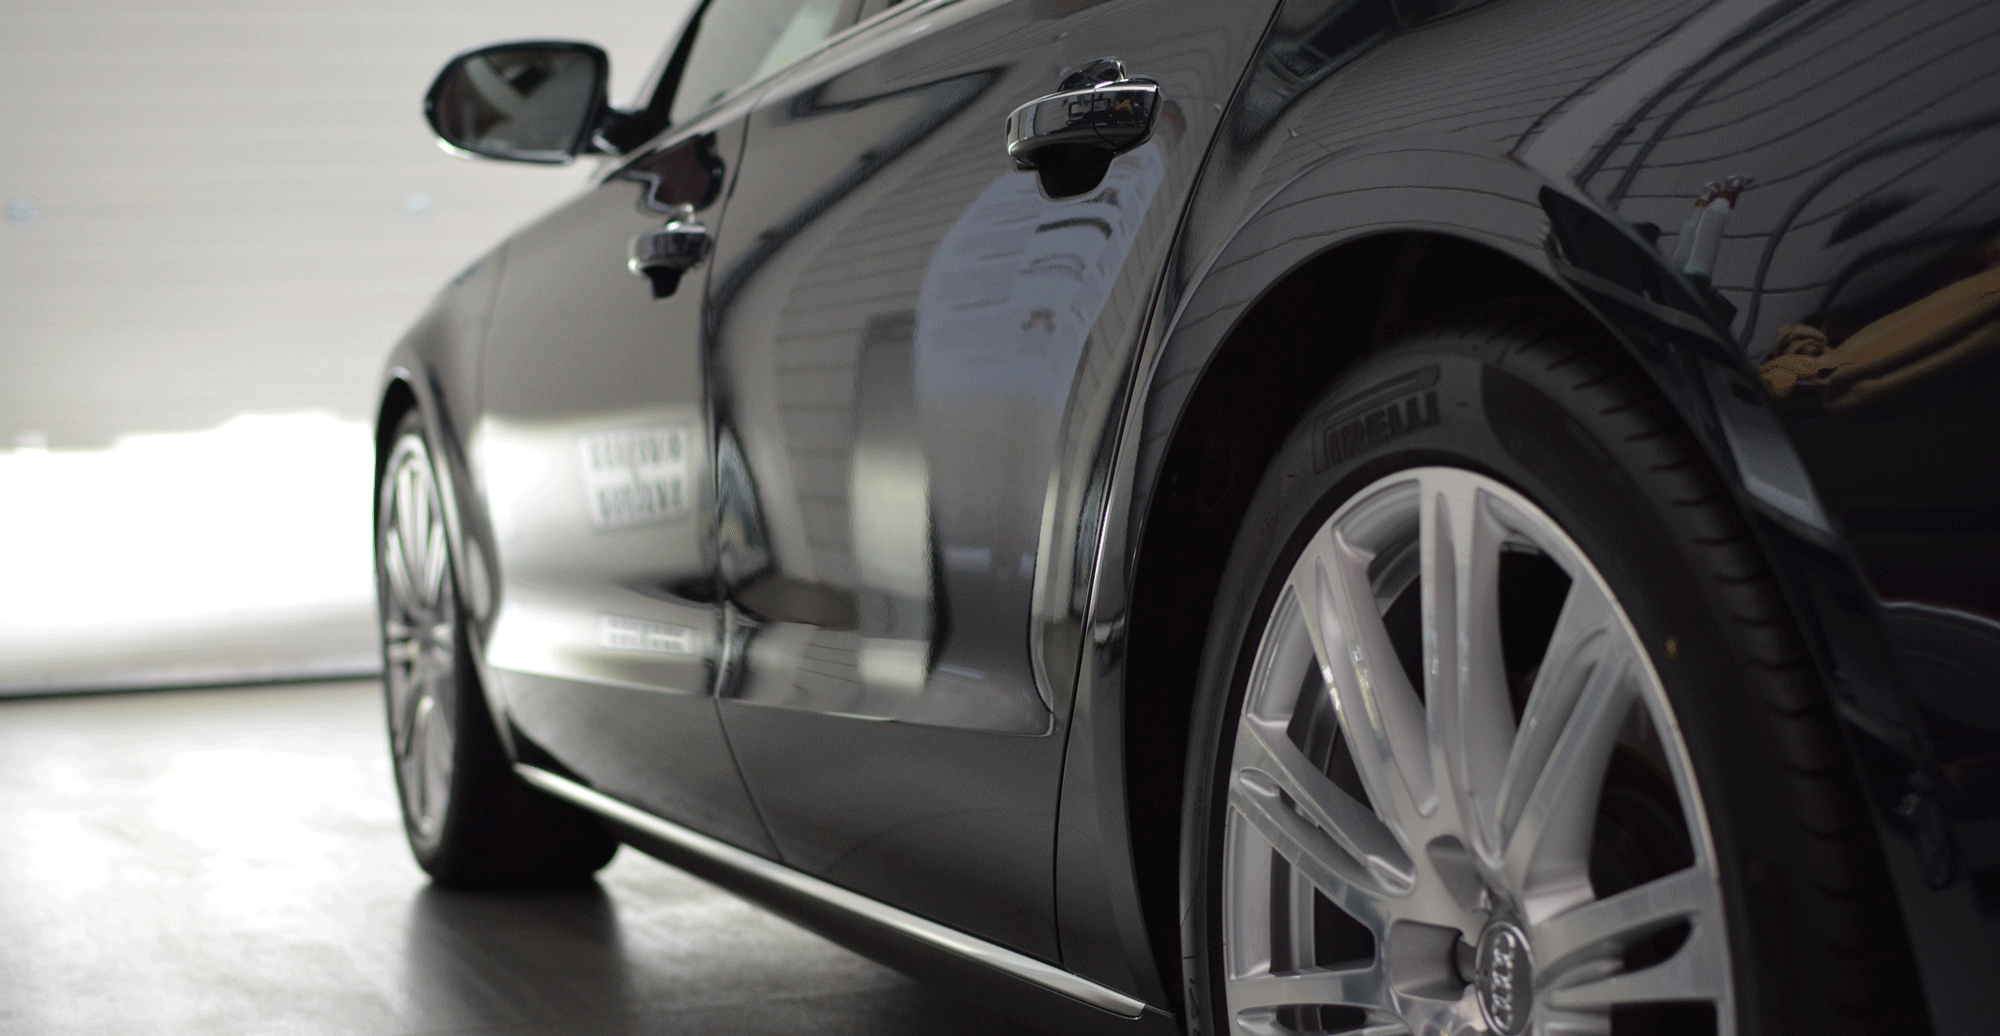 Audi A8 V6 4.2 TDI Quattro